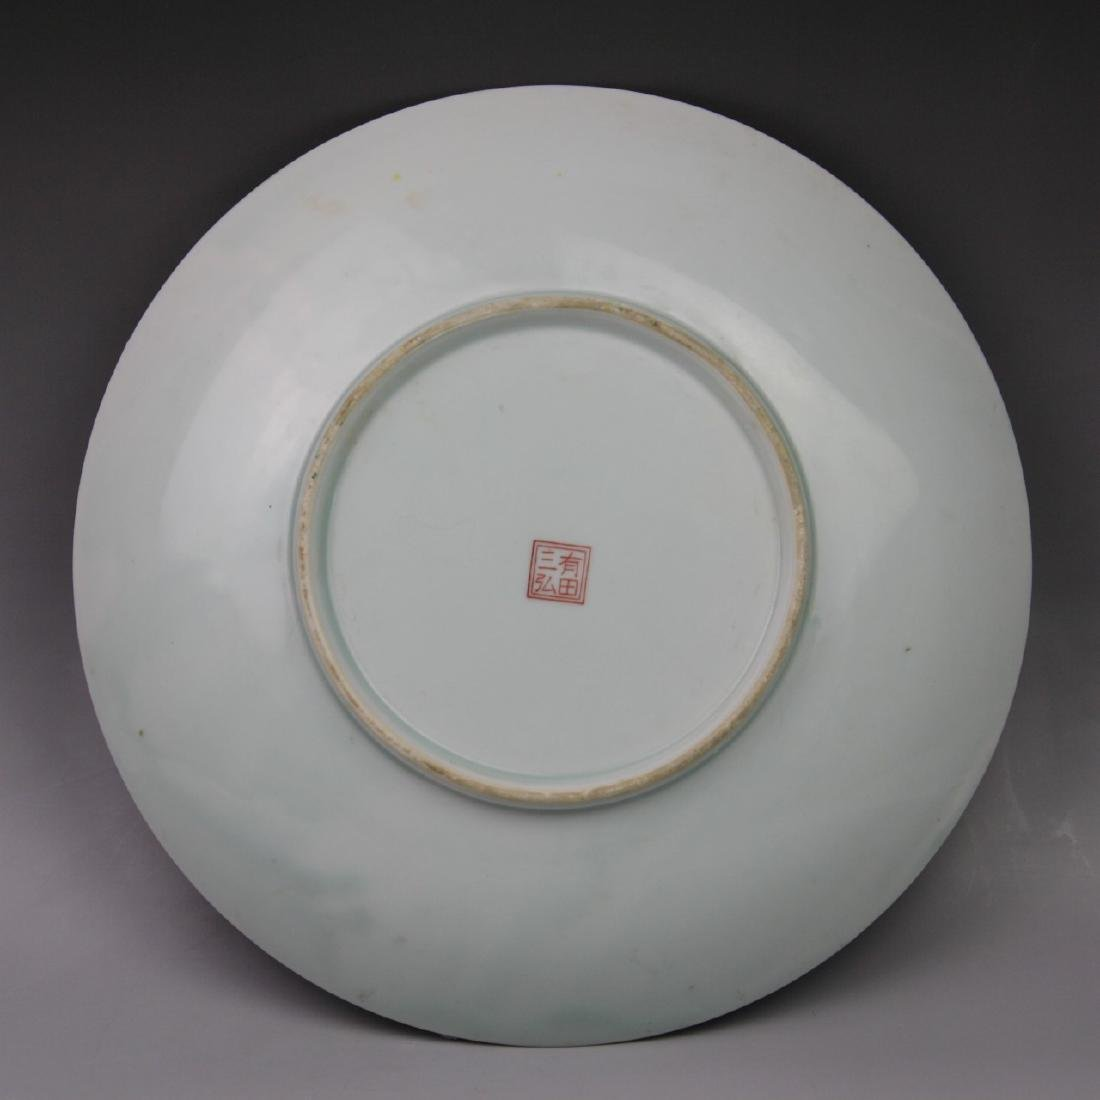 Two Japanese Ceramic Plates, An Imari & A Studio - 3